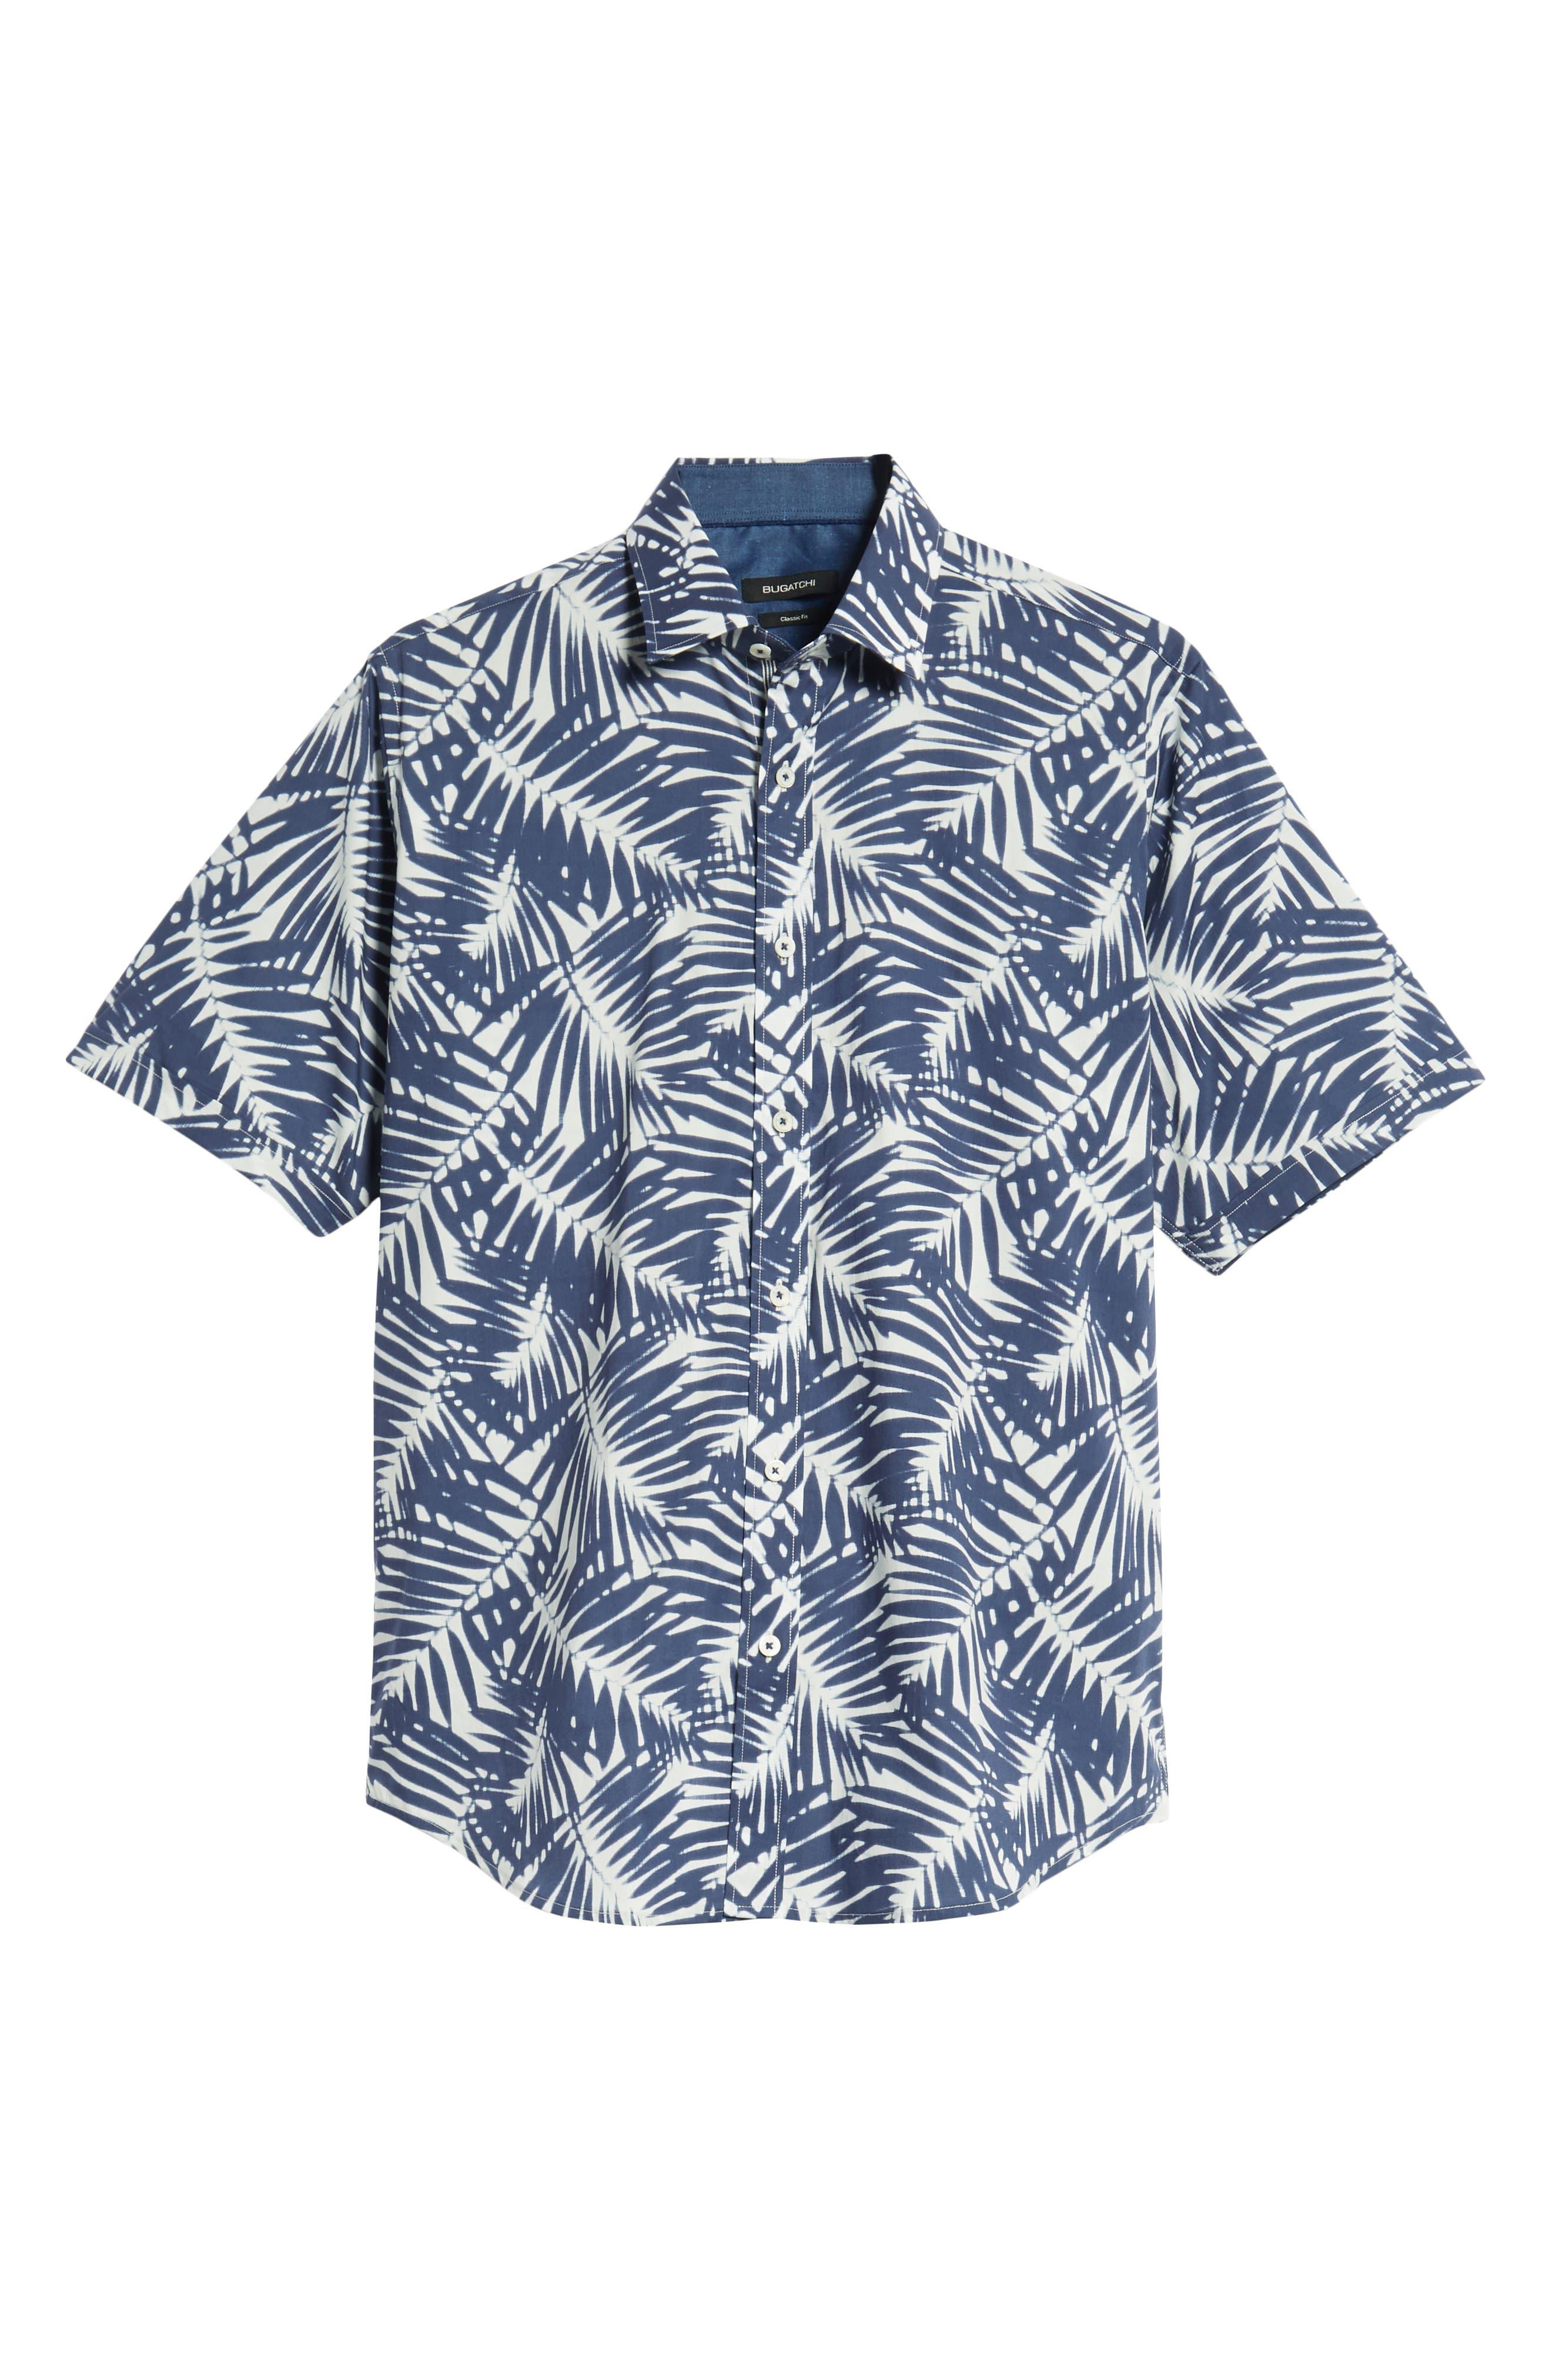 Indigo Palms Classic Fit Sport Shirt,                             Alternate thumbnail 5, color,                             NAVY